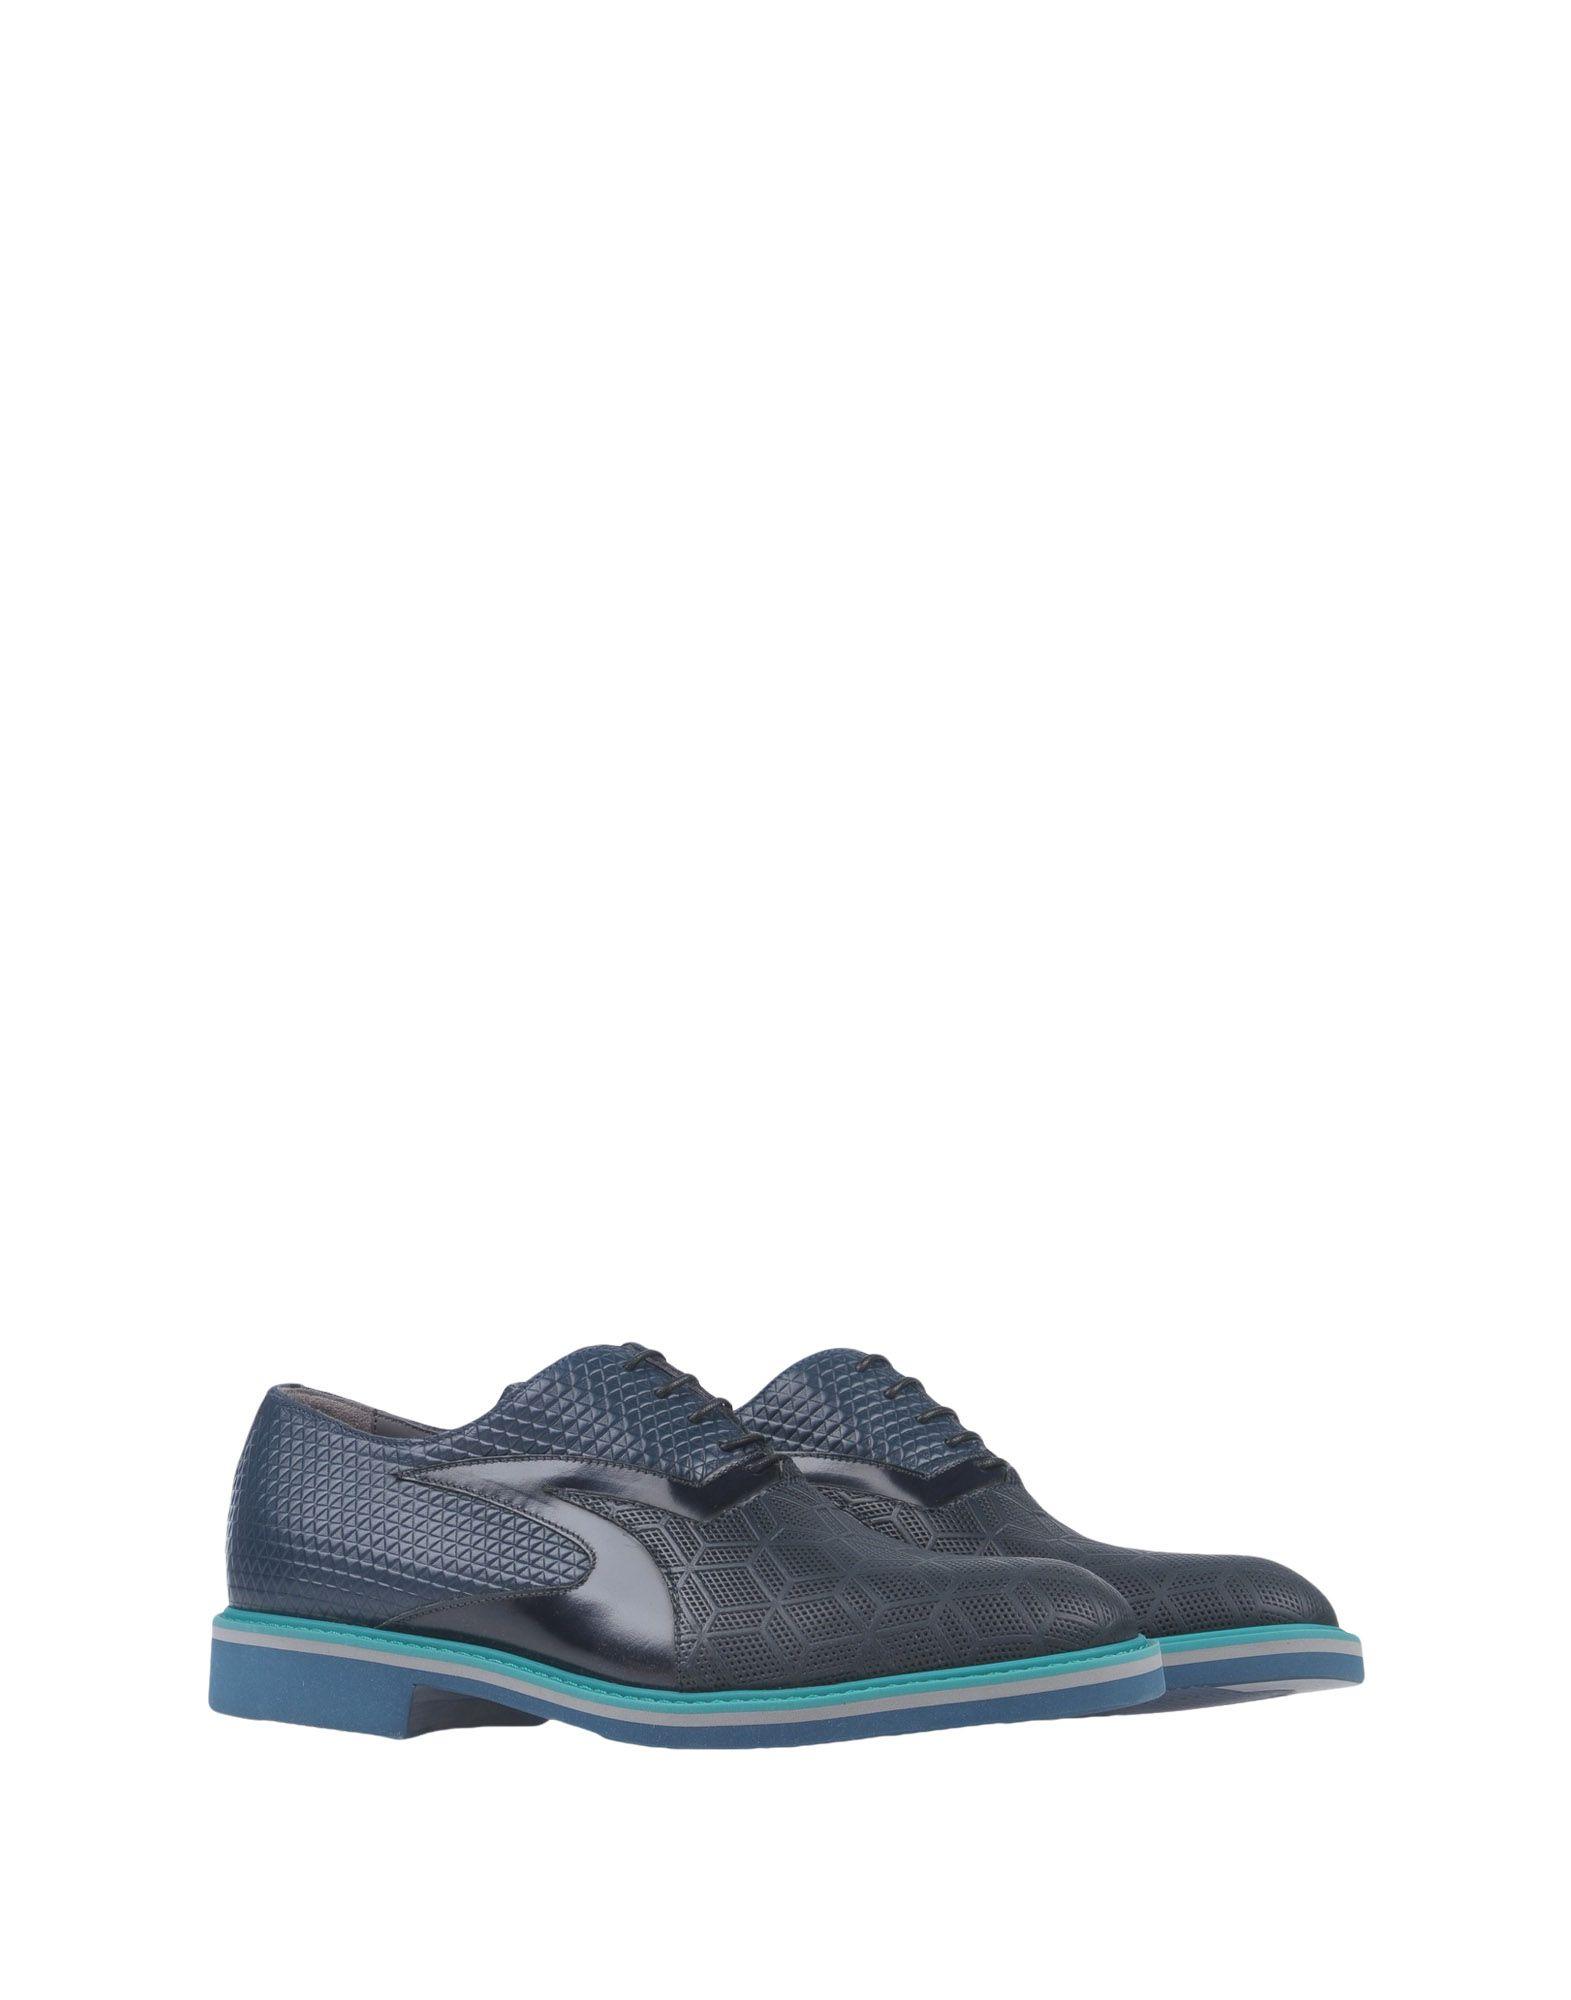 Pollini Schnürschuhe Herren  beliebte 11331346DM Gute Qualität beliebte  Schuhe 4a306e